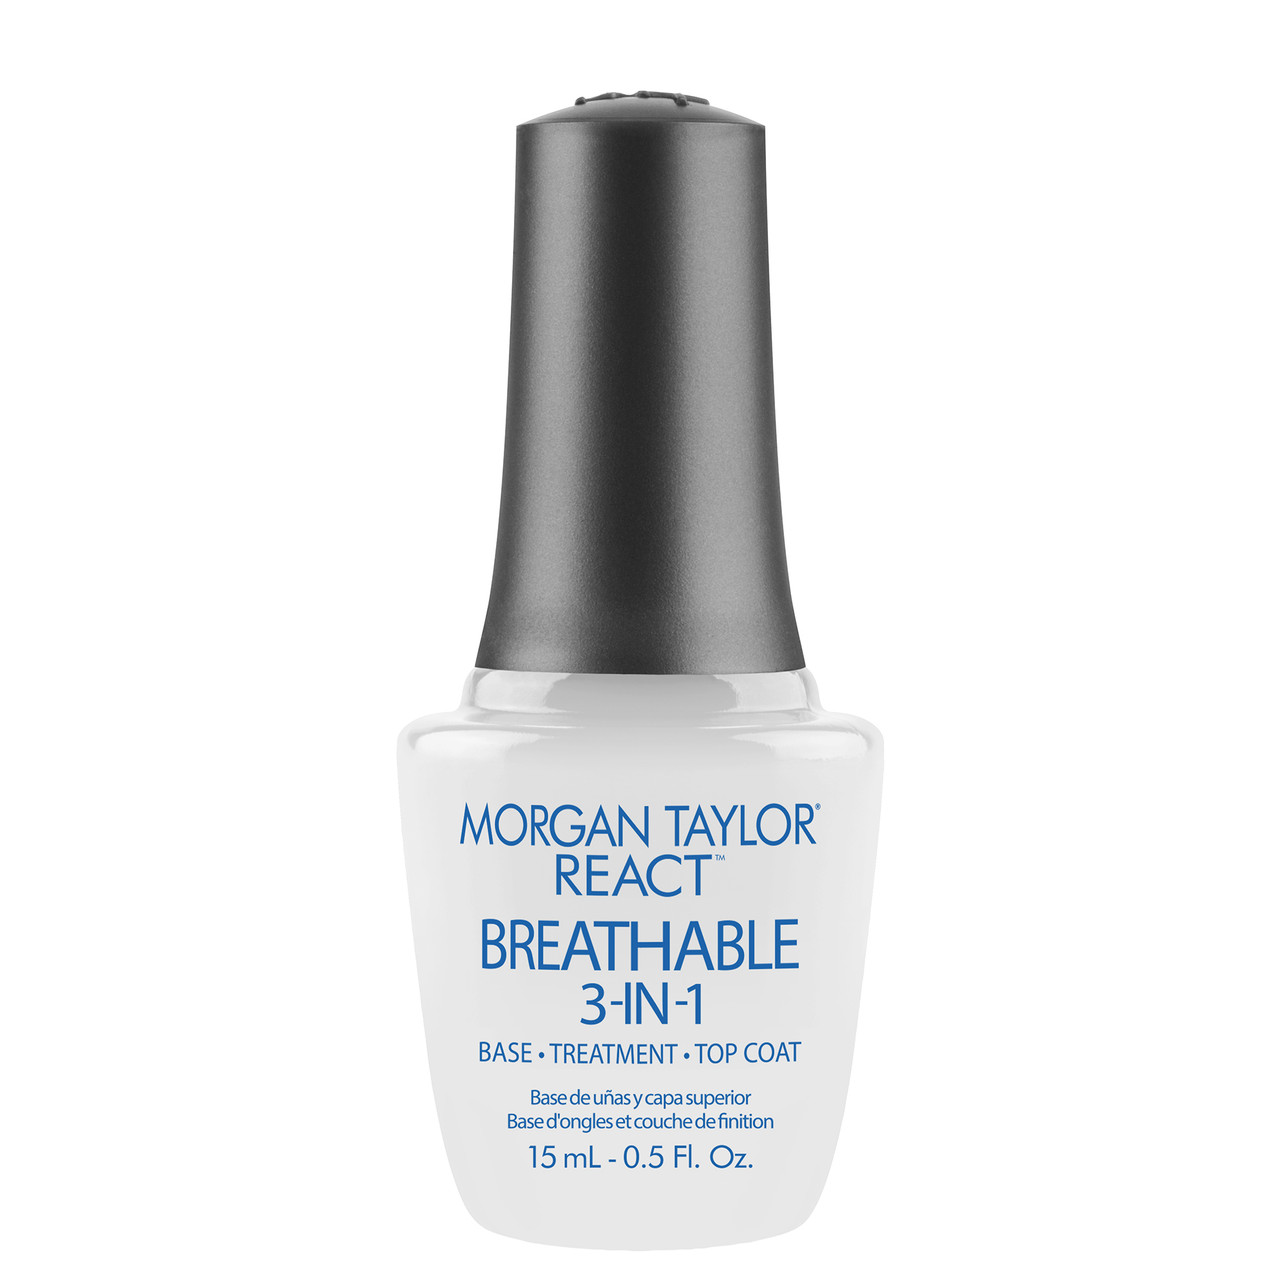 Morgan Taylor React Breathable, 3-in-1 Base Coat, Treatment, Top Coat, 15 mL   .5 fl. oz.